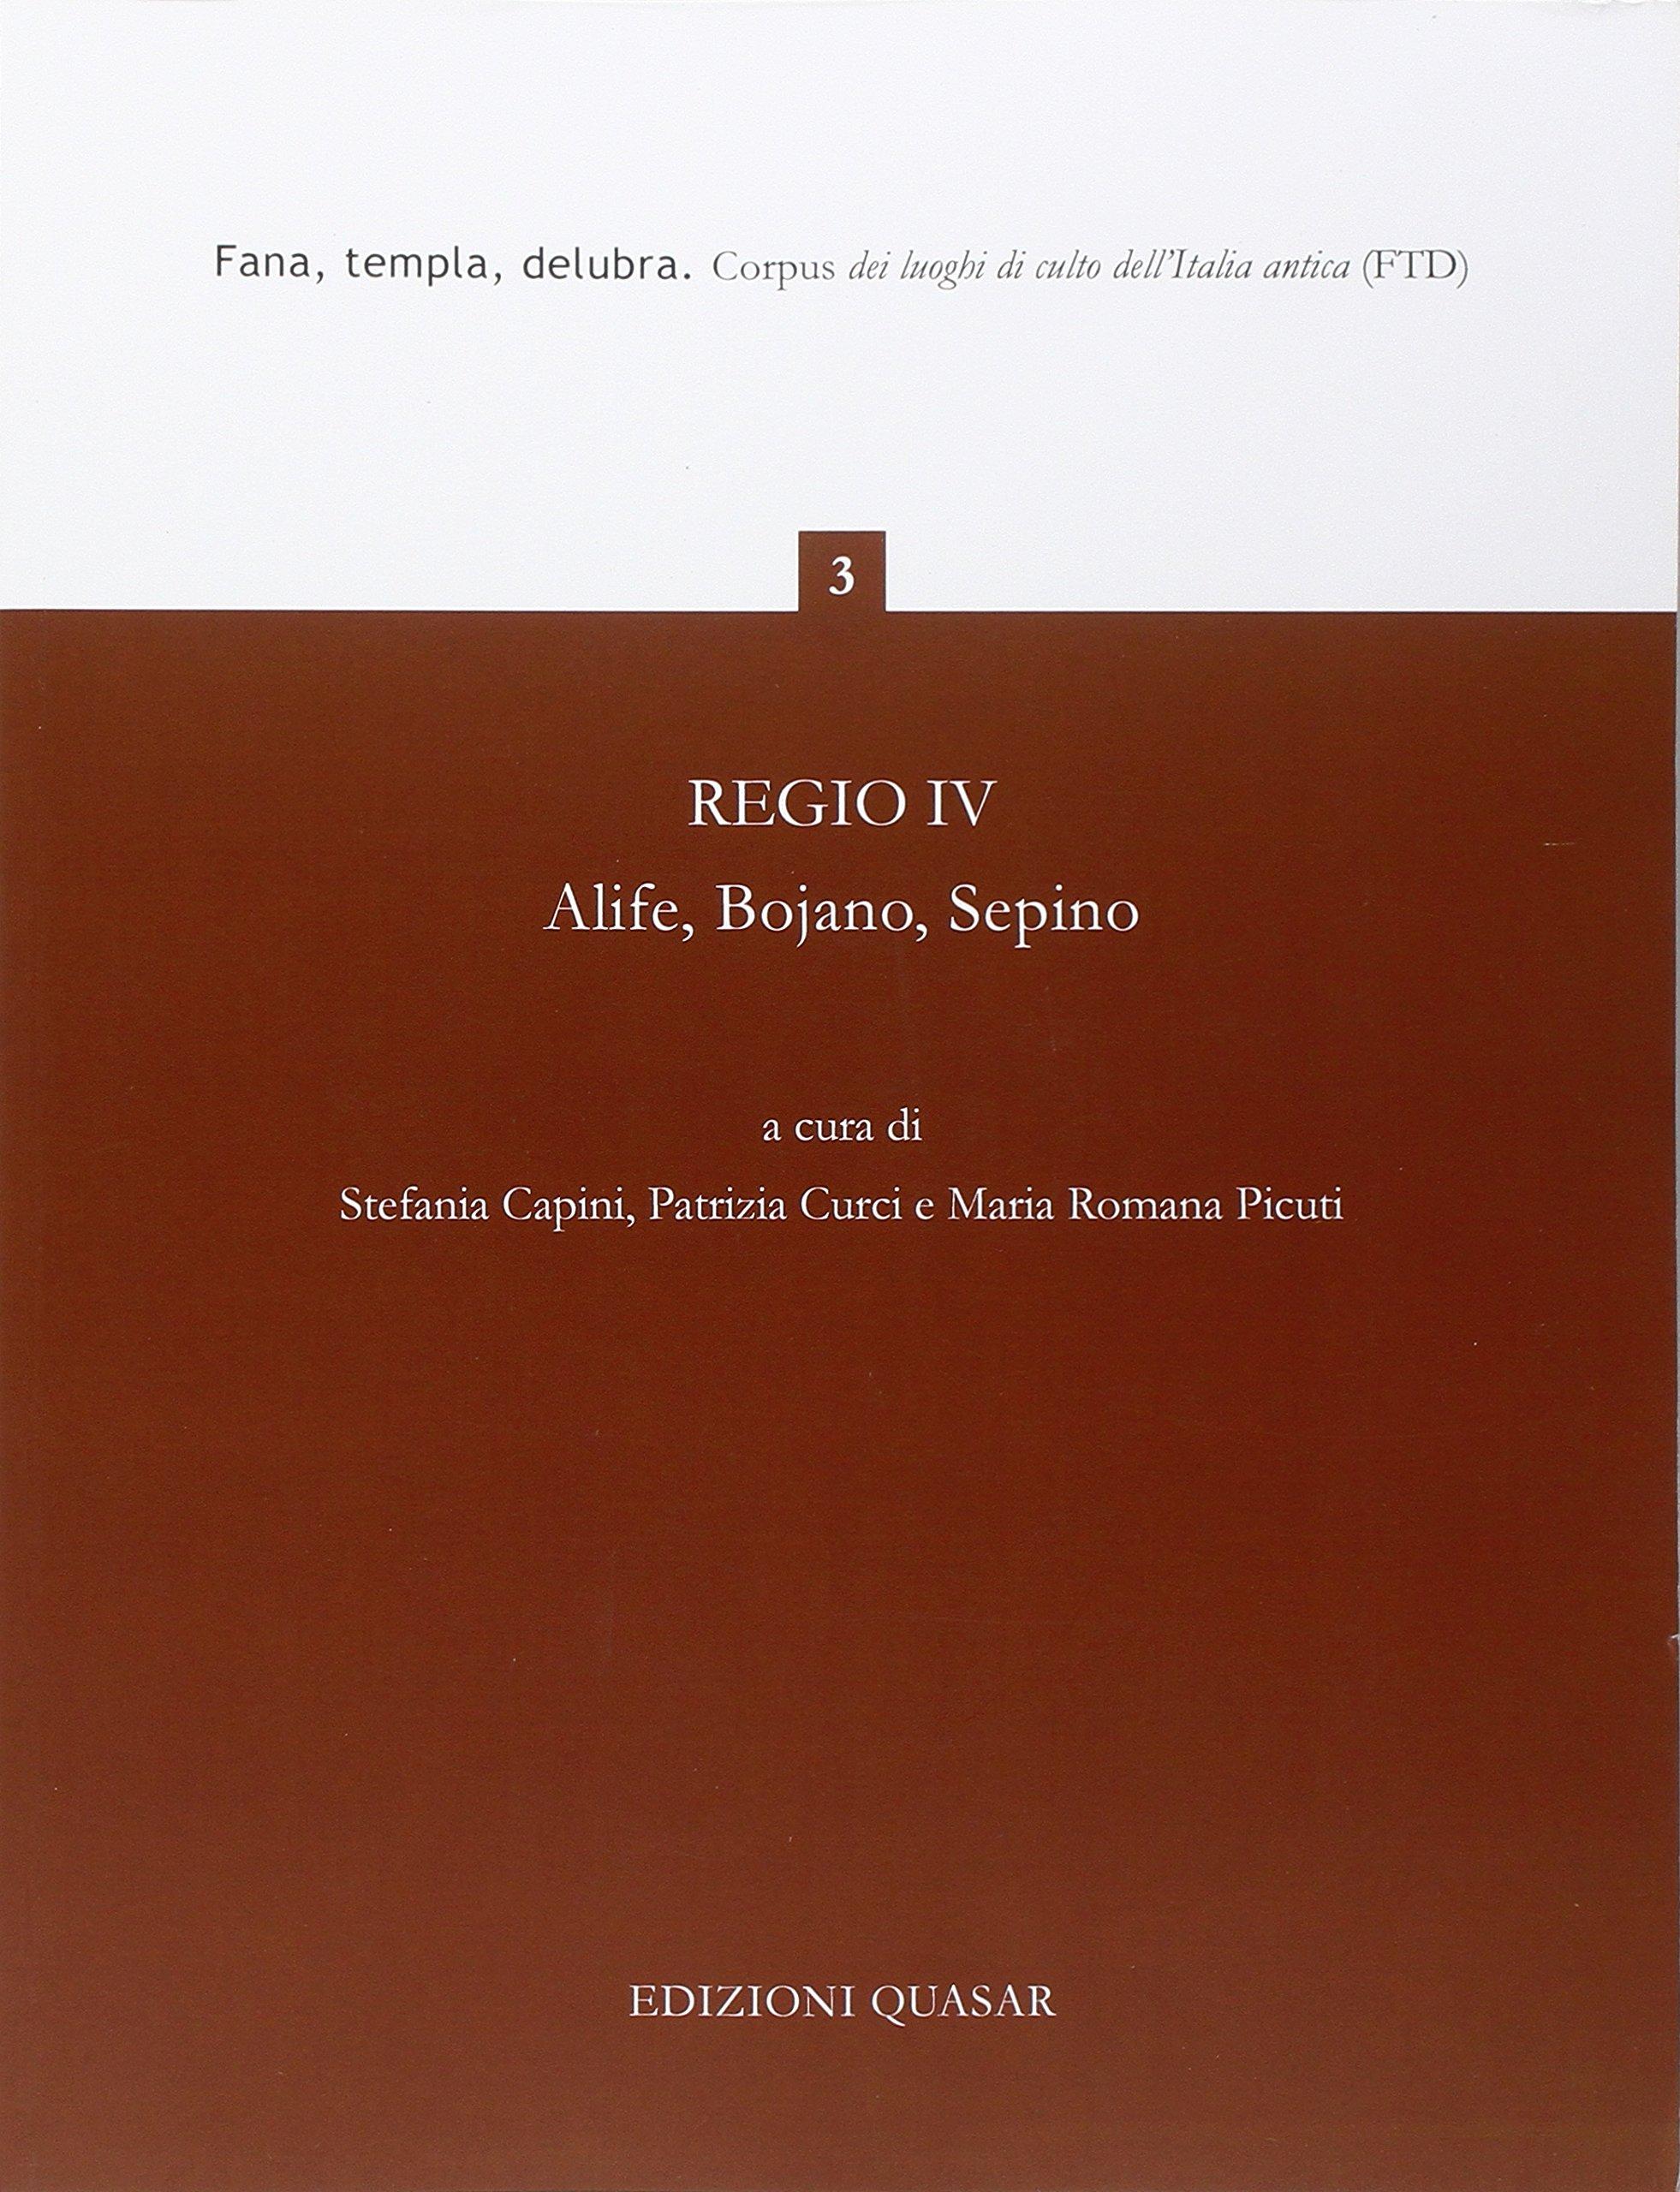 Regio IV. Alife, Bojano, Sepino, Fana, Templa, Delubra Copertina flessibile – 1 mar 2015 M. R. Picuti S. Capini P. Curci Quasar